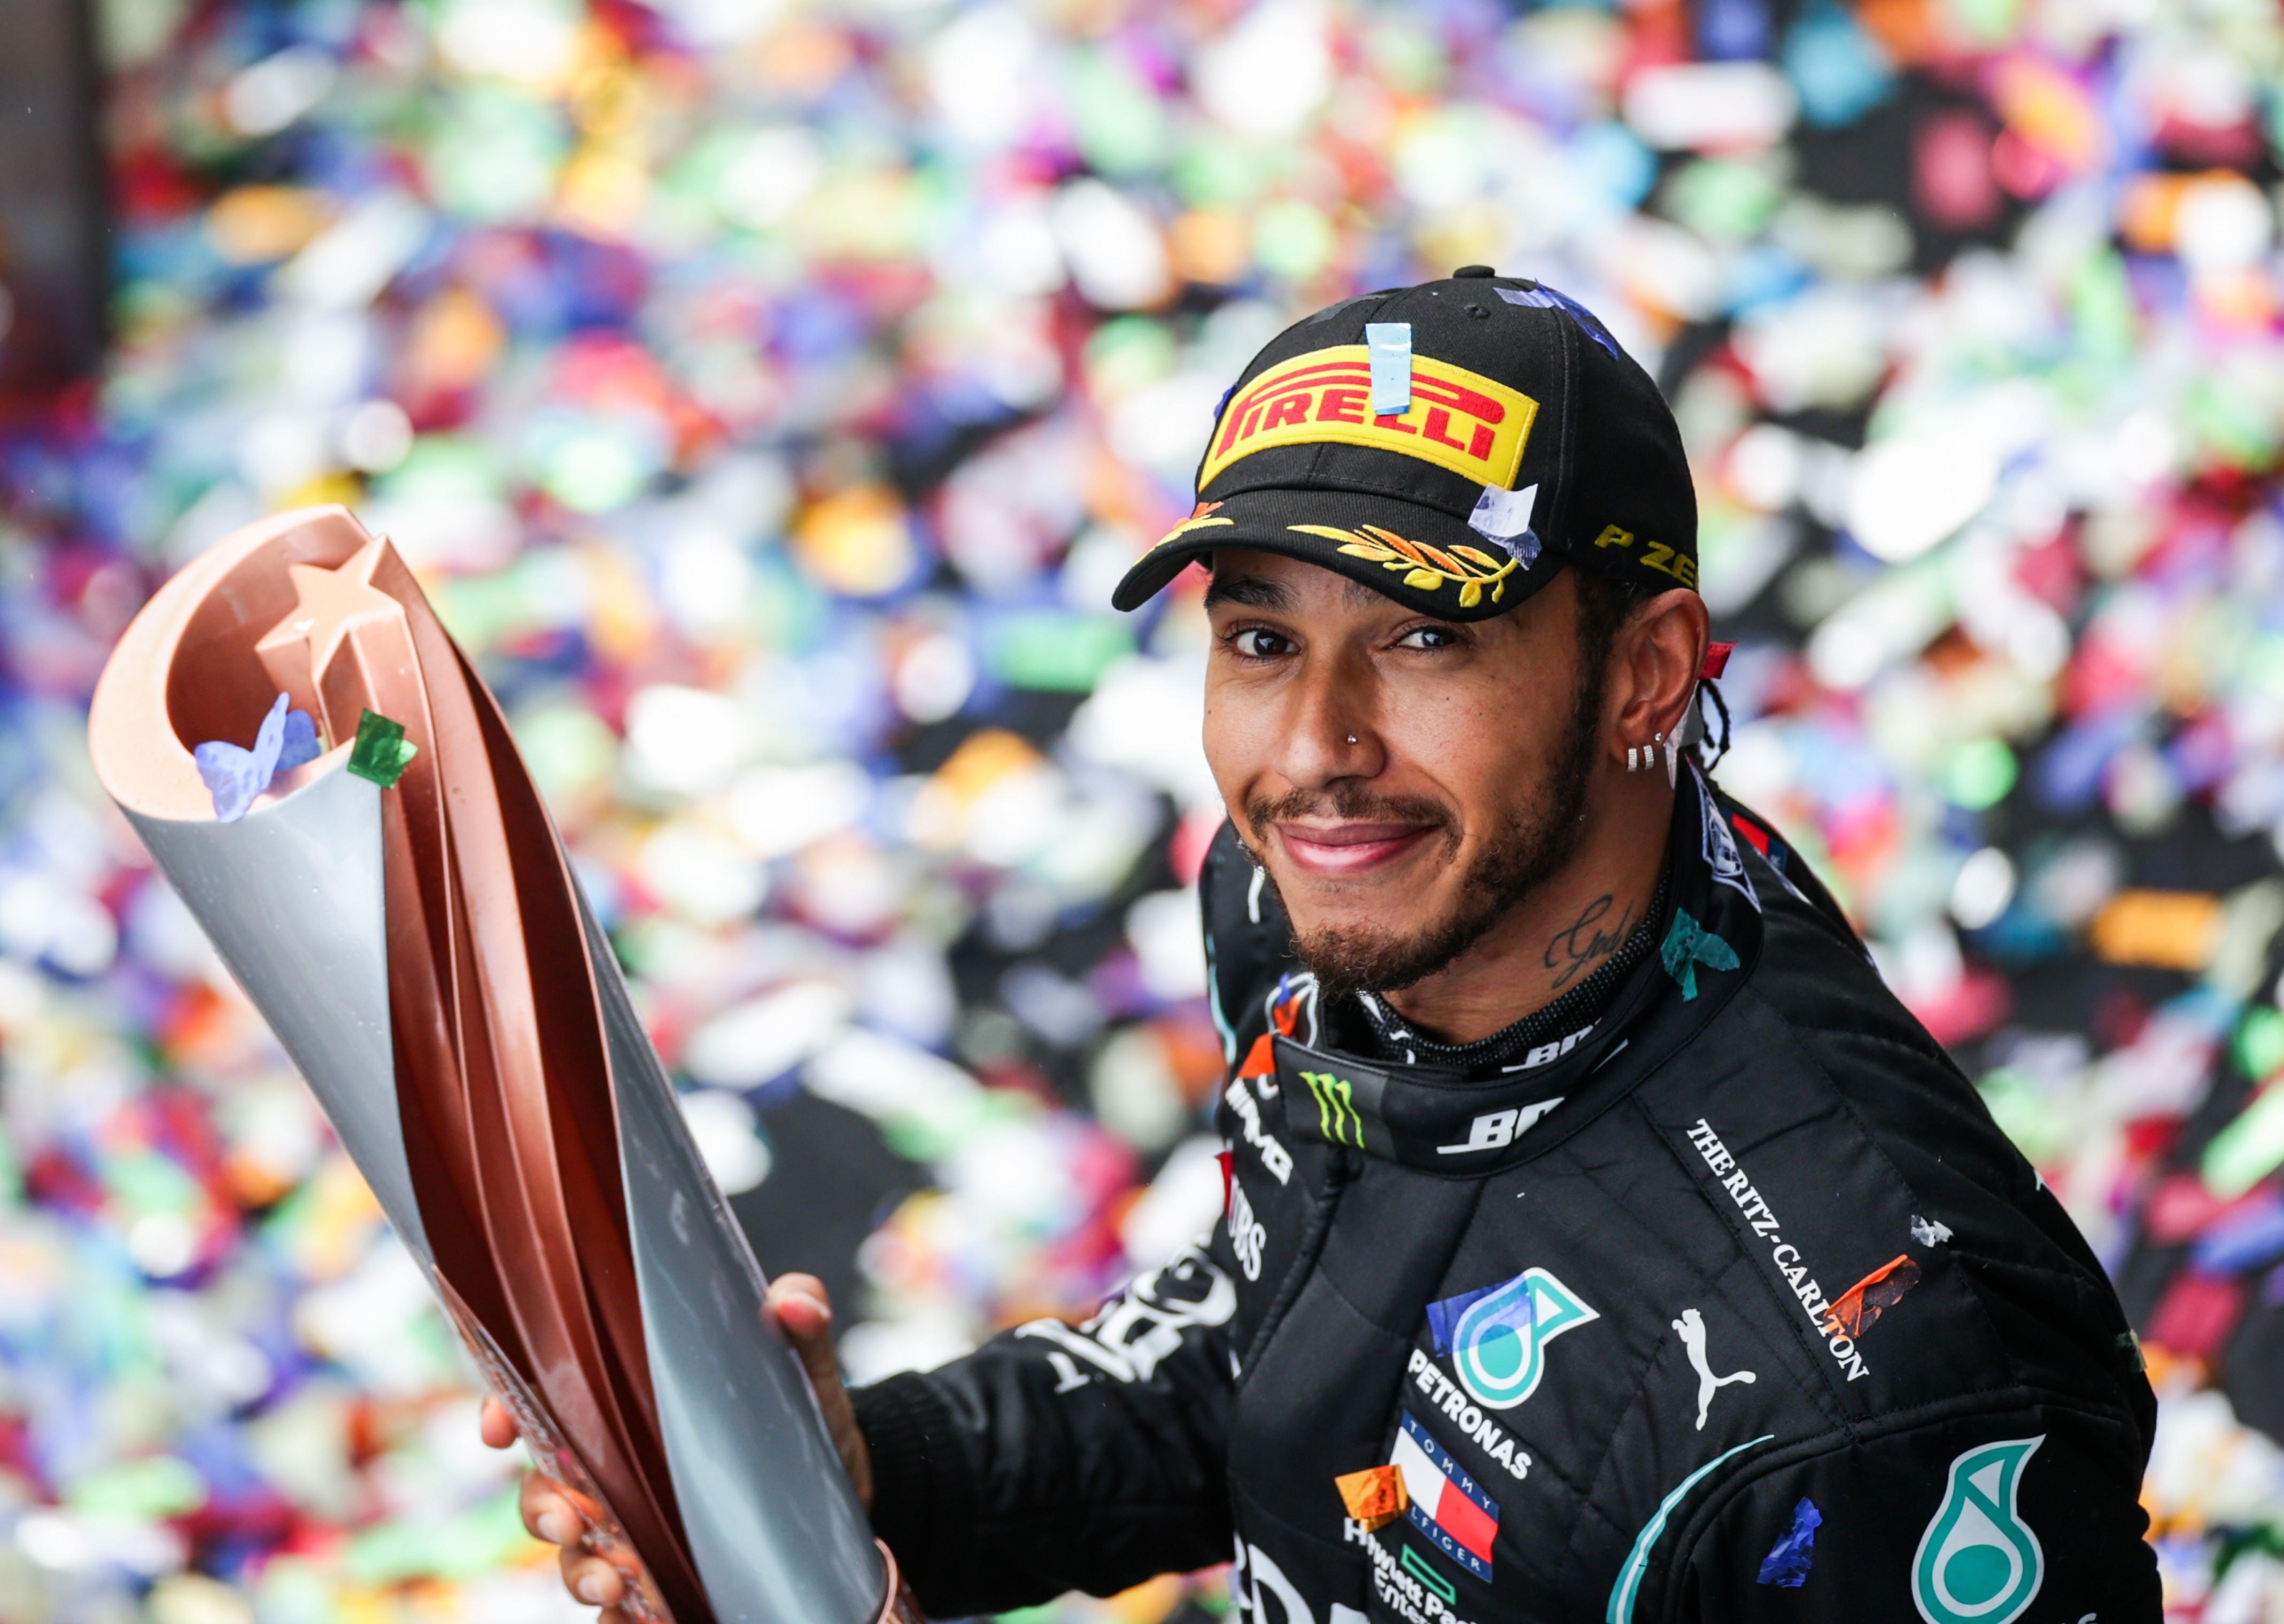 Lewis Hamilton makes history as he wins his seventh Formula 1 title lindaikejisblog